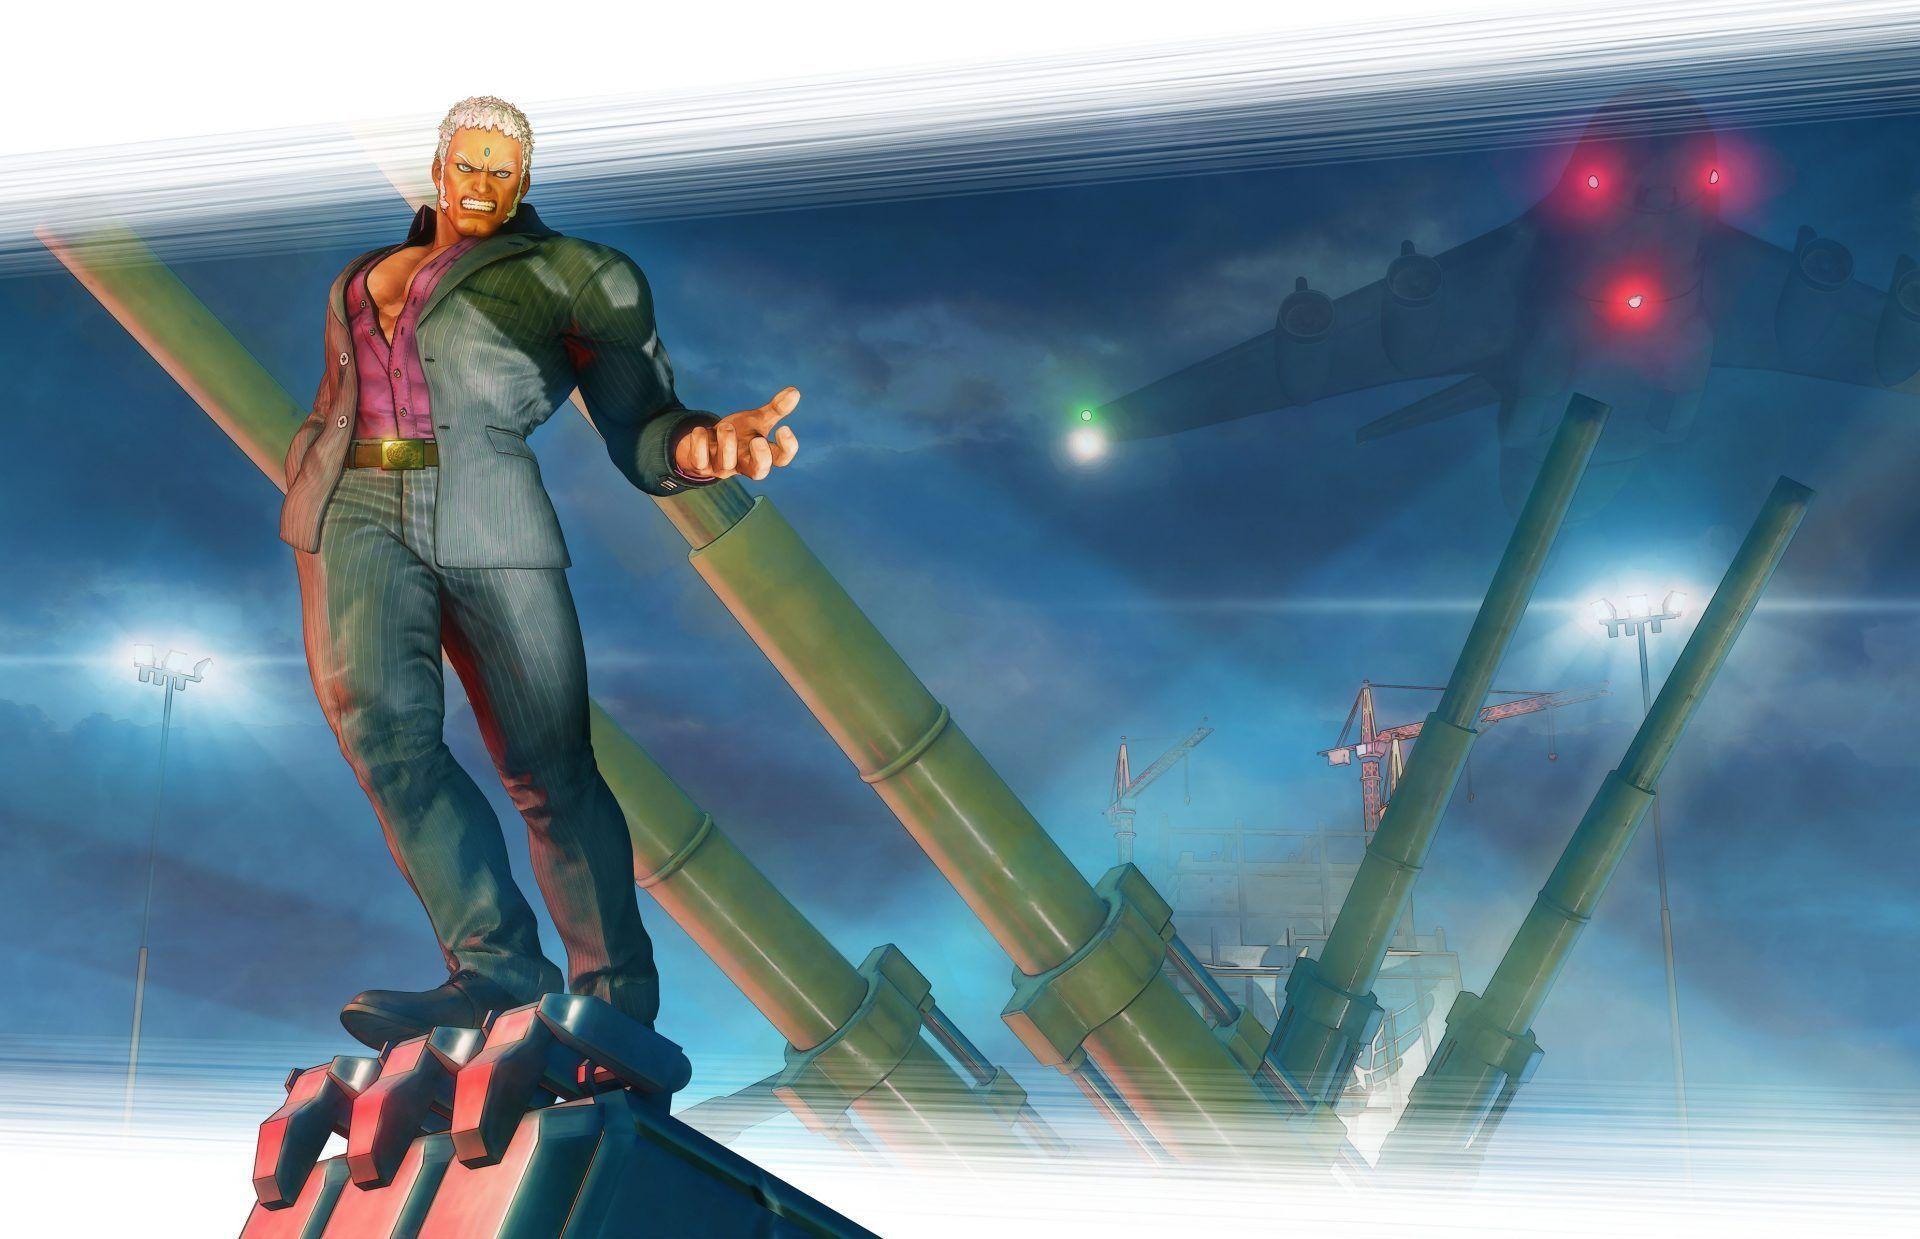 Street Fighter V – Urien Gameplay Trailer https://jogos.zwame.pt/video/street-fighter-v-urien-gameplay-trailer